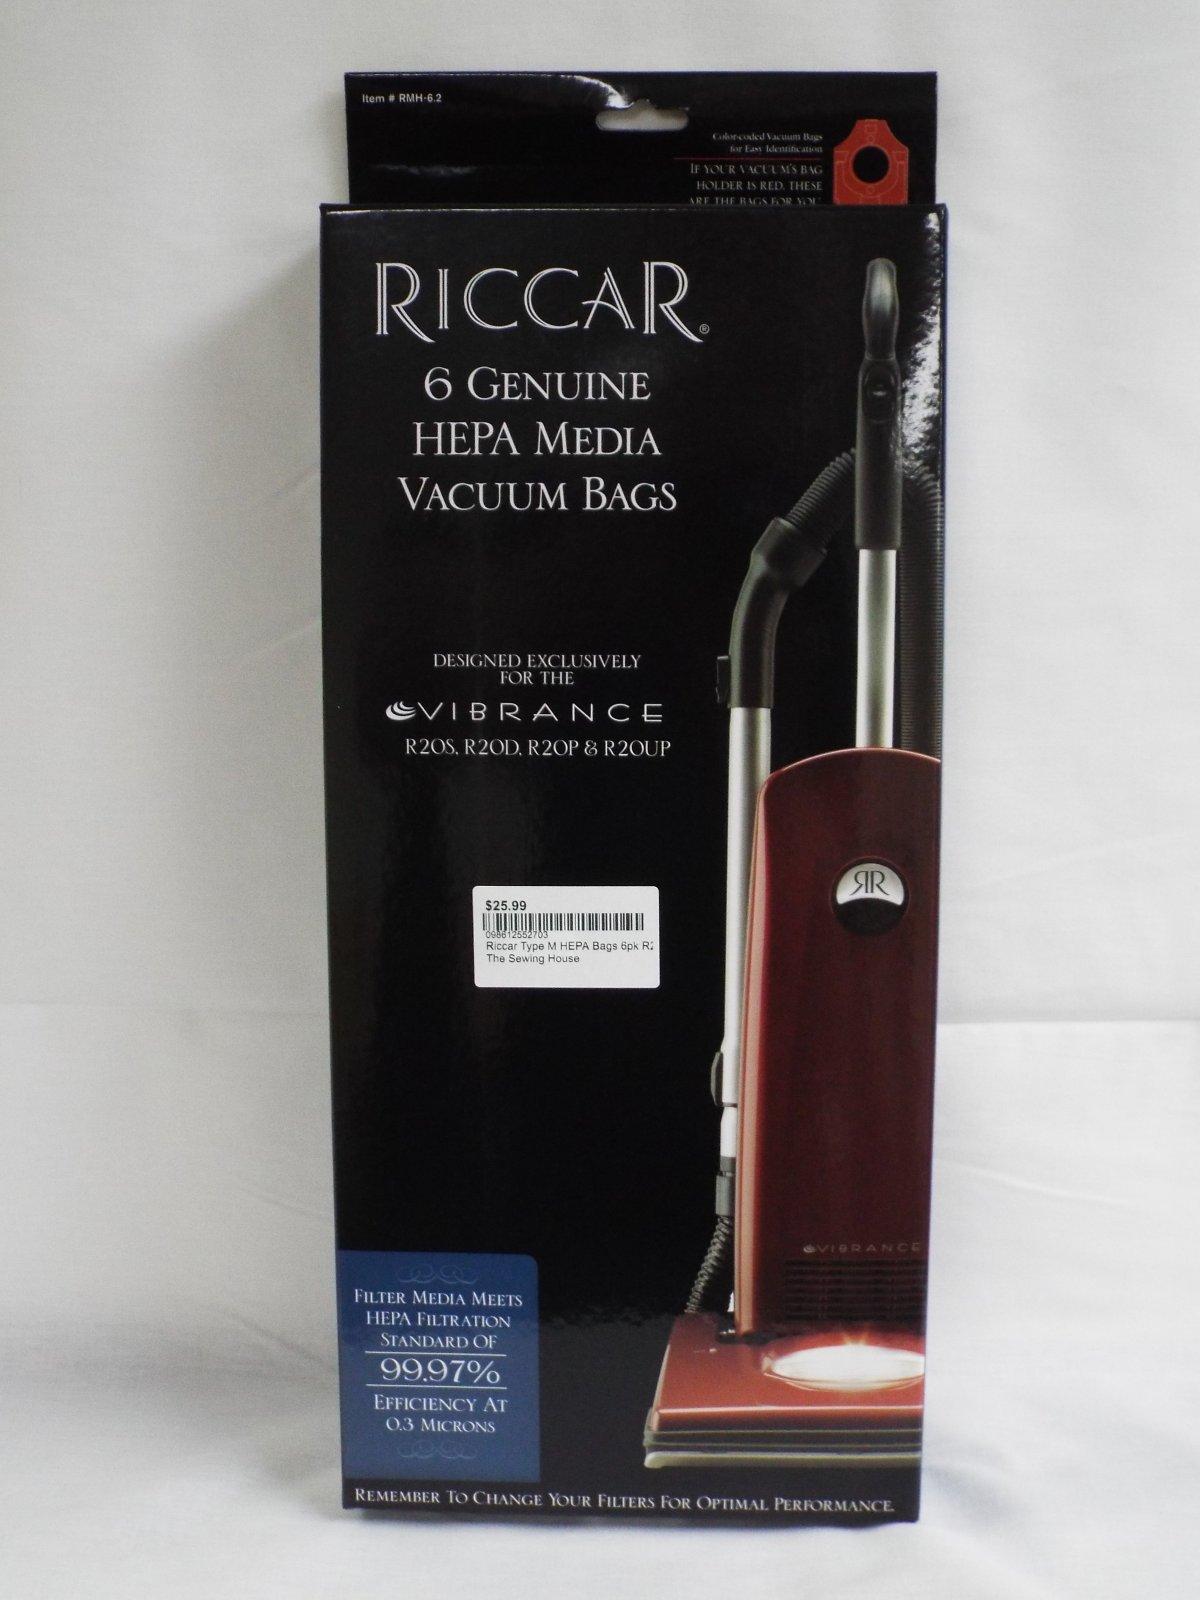 Riccar Type M HEPA Bags 6pk R20D, R20P & R20UP